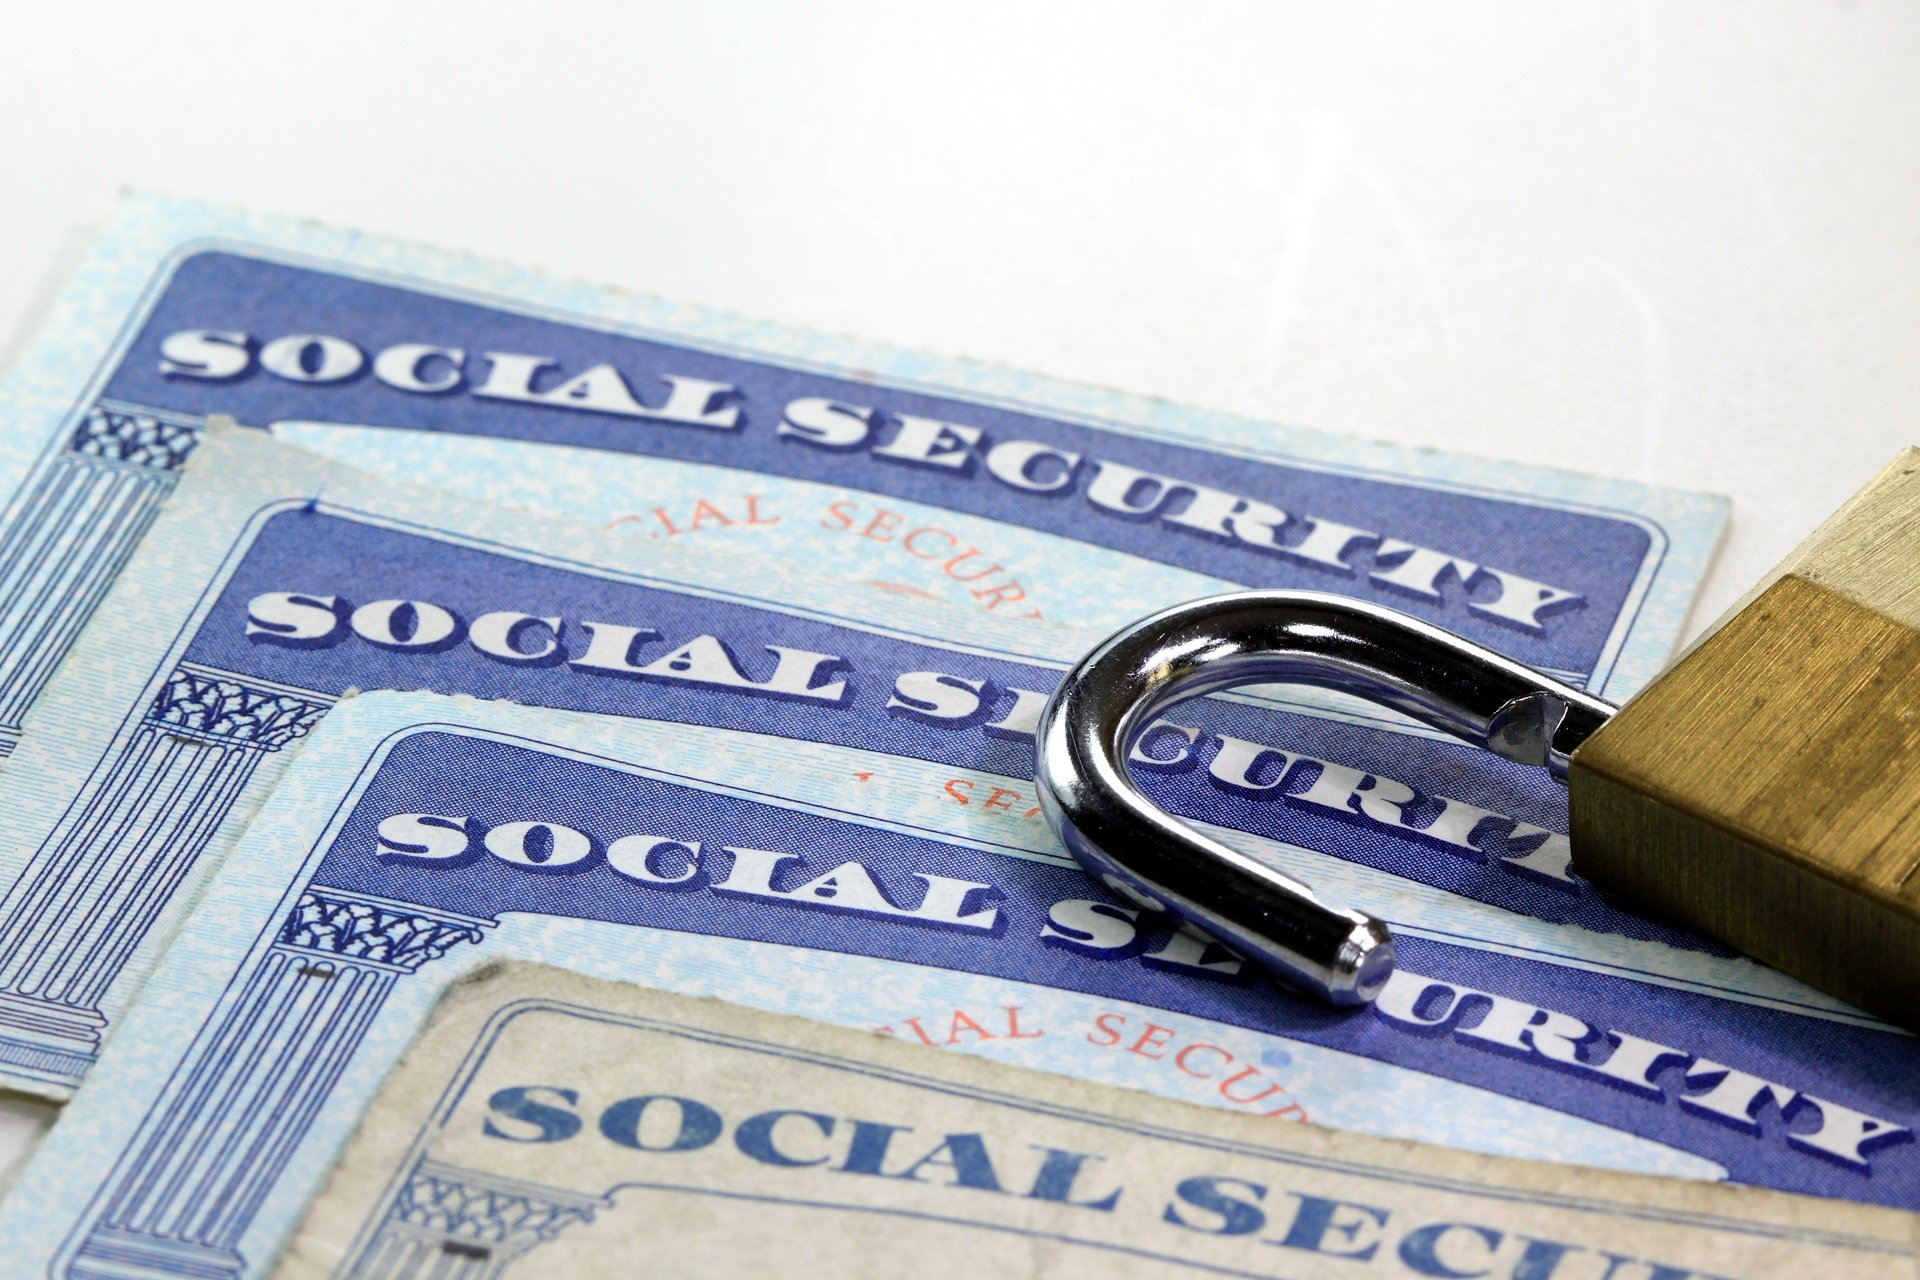 A padlock on Social Security cards